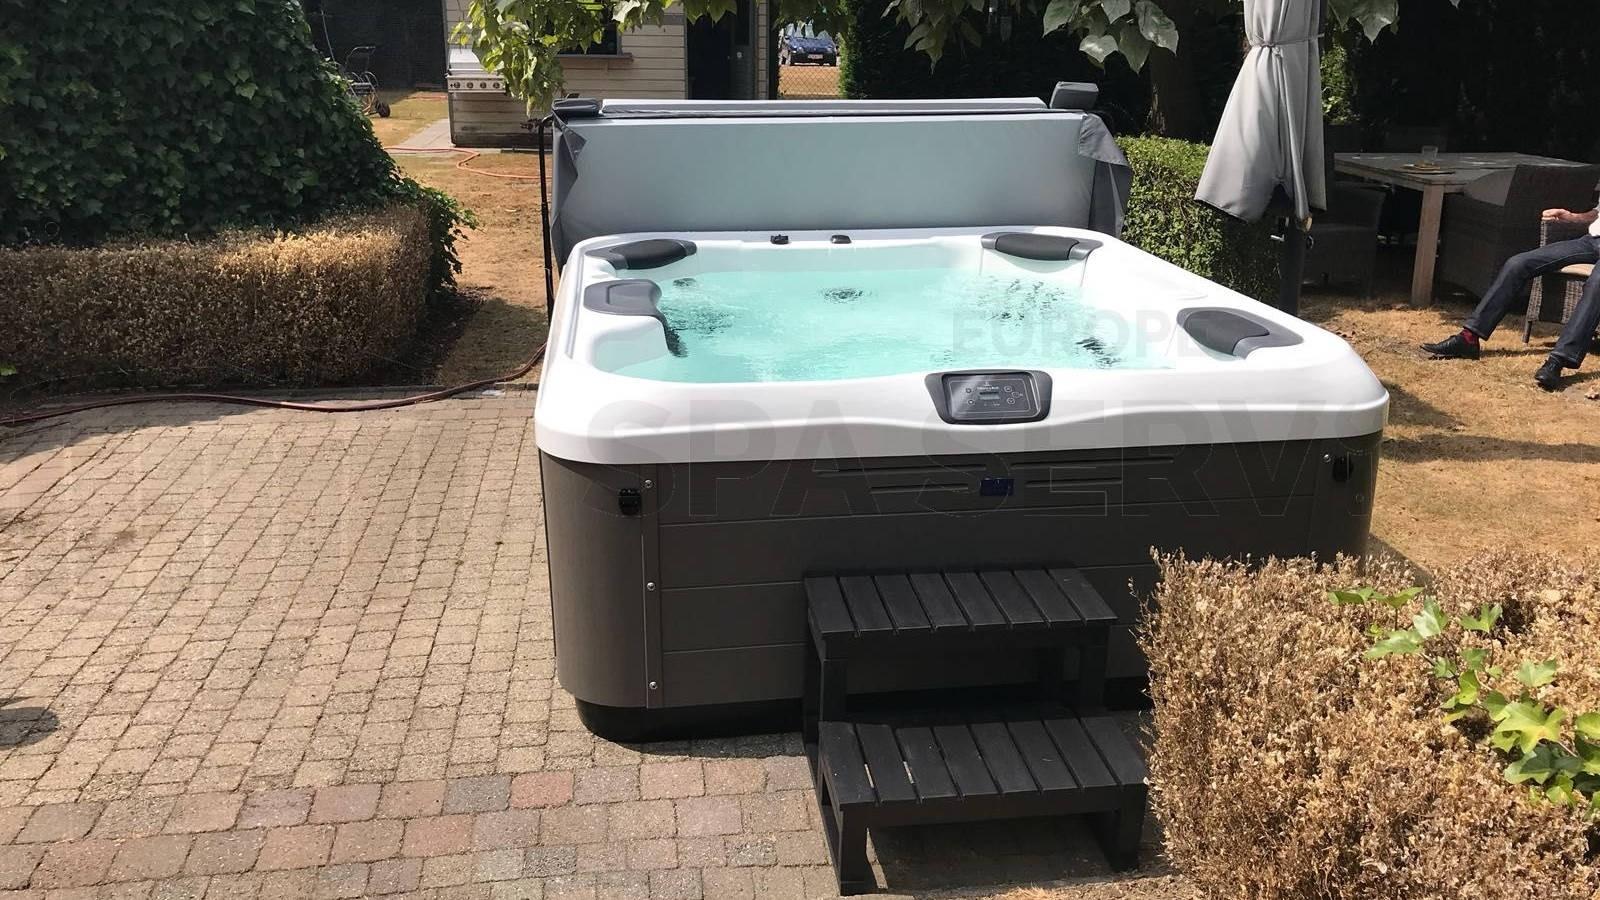 Plaatsing Villeroy & Boch R6LE spa in Bornem België